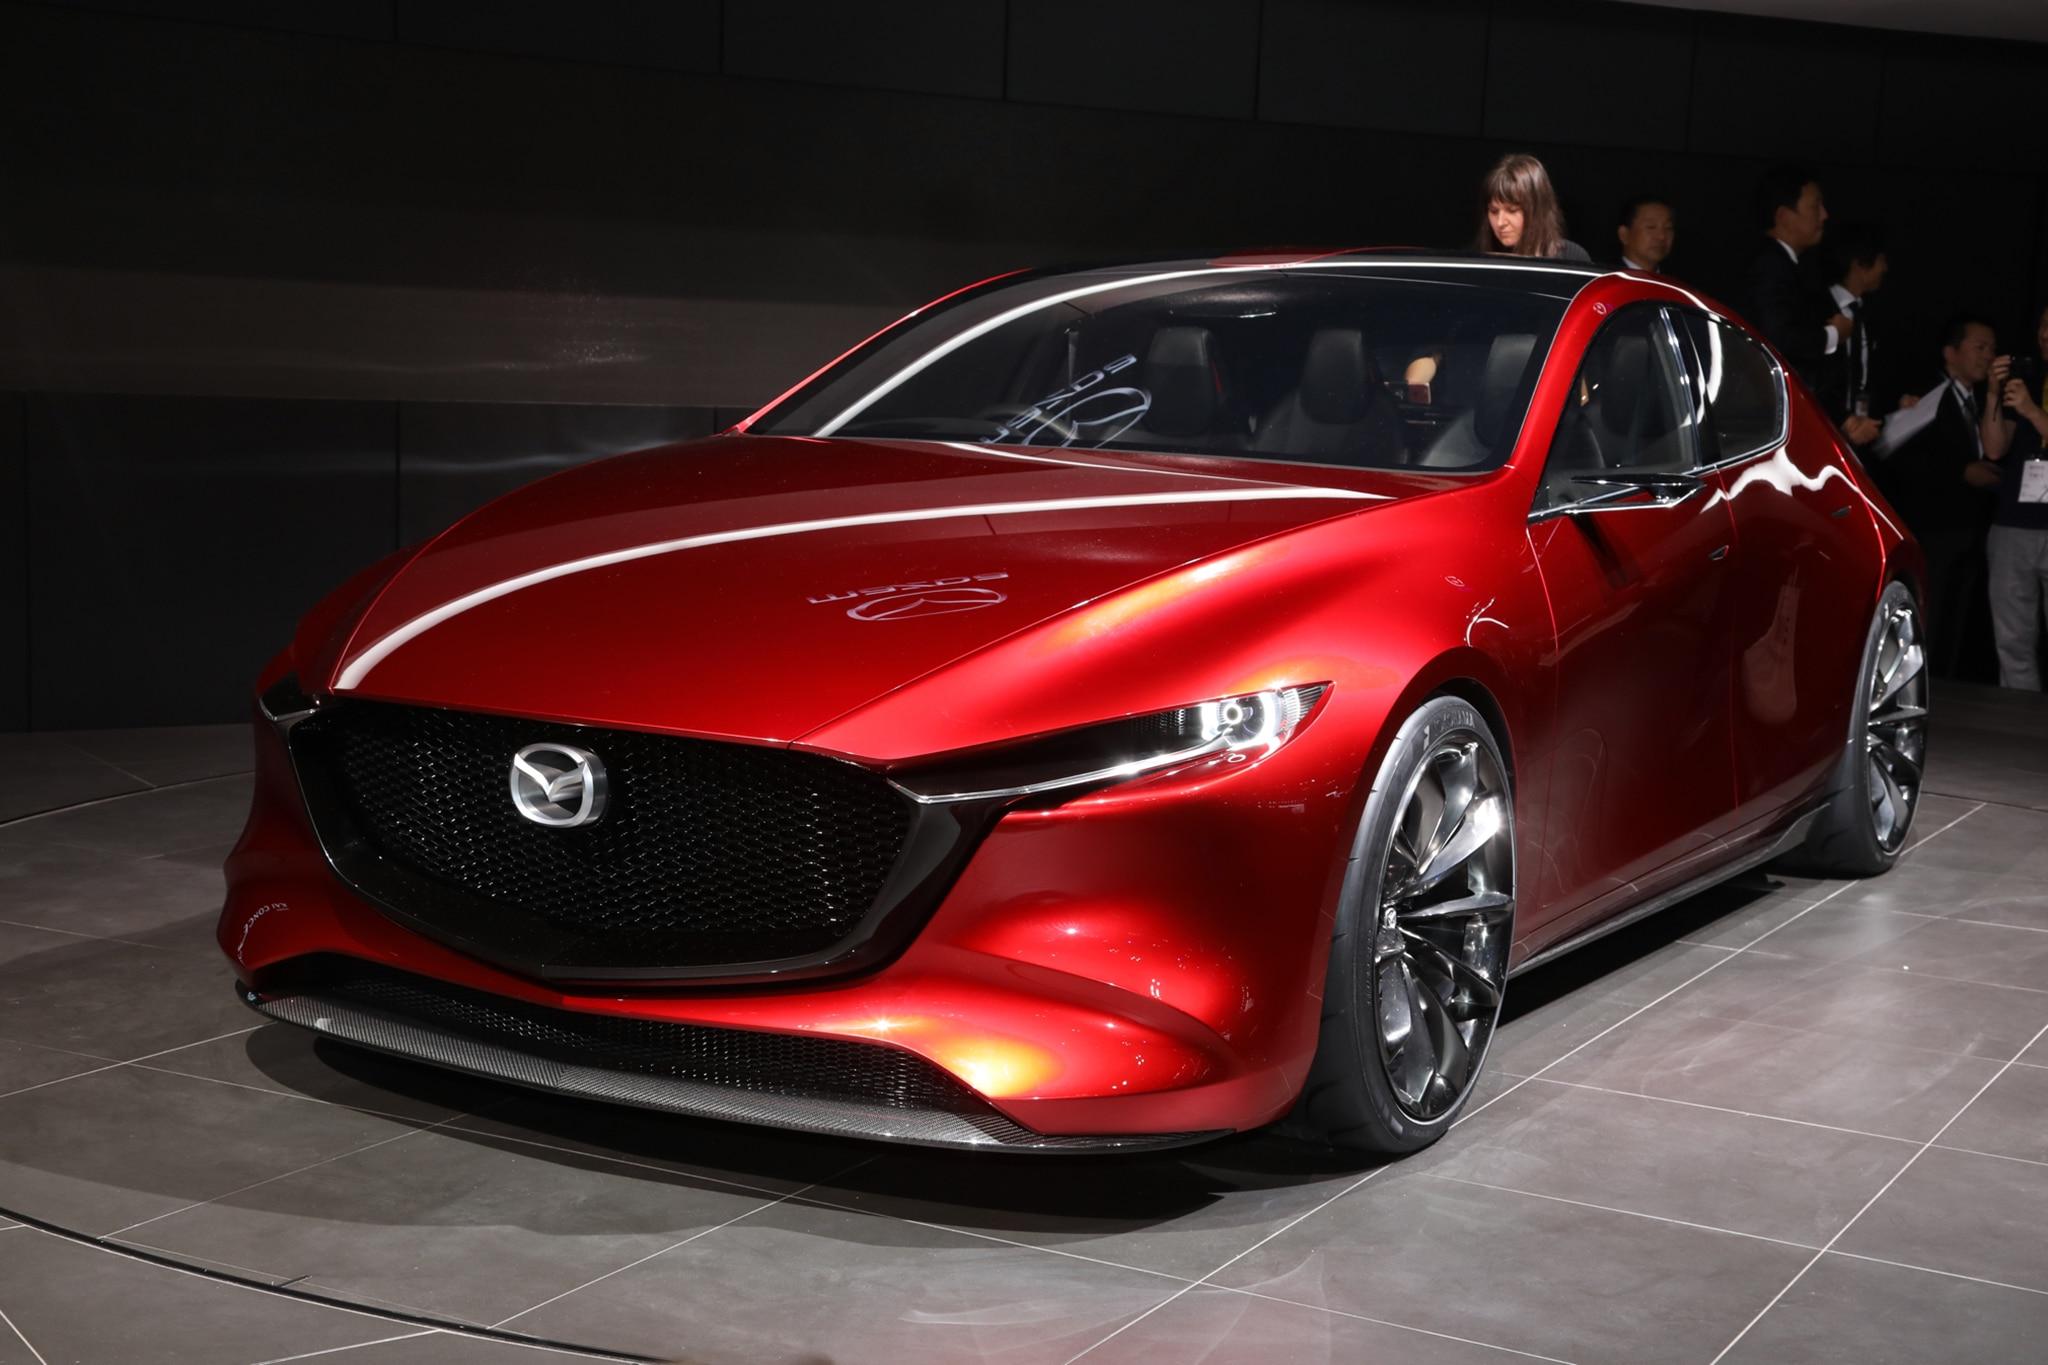 https://st.automobilemag.com/uploads/sites/11/2017/10/Mazda-Kai-concept-front-three-quarter-01.jpg